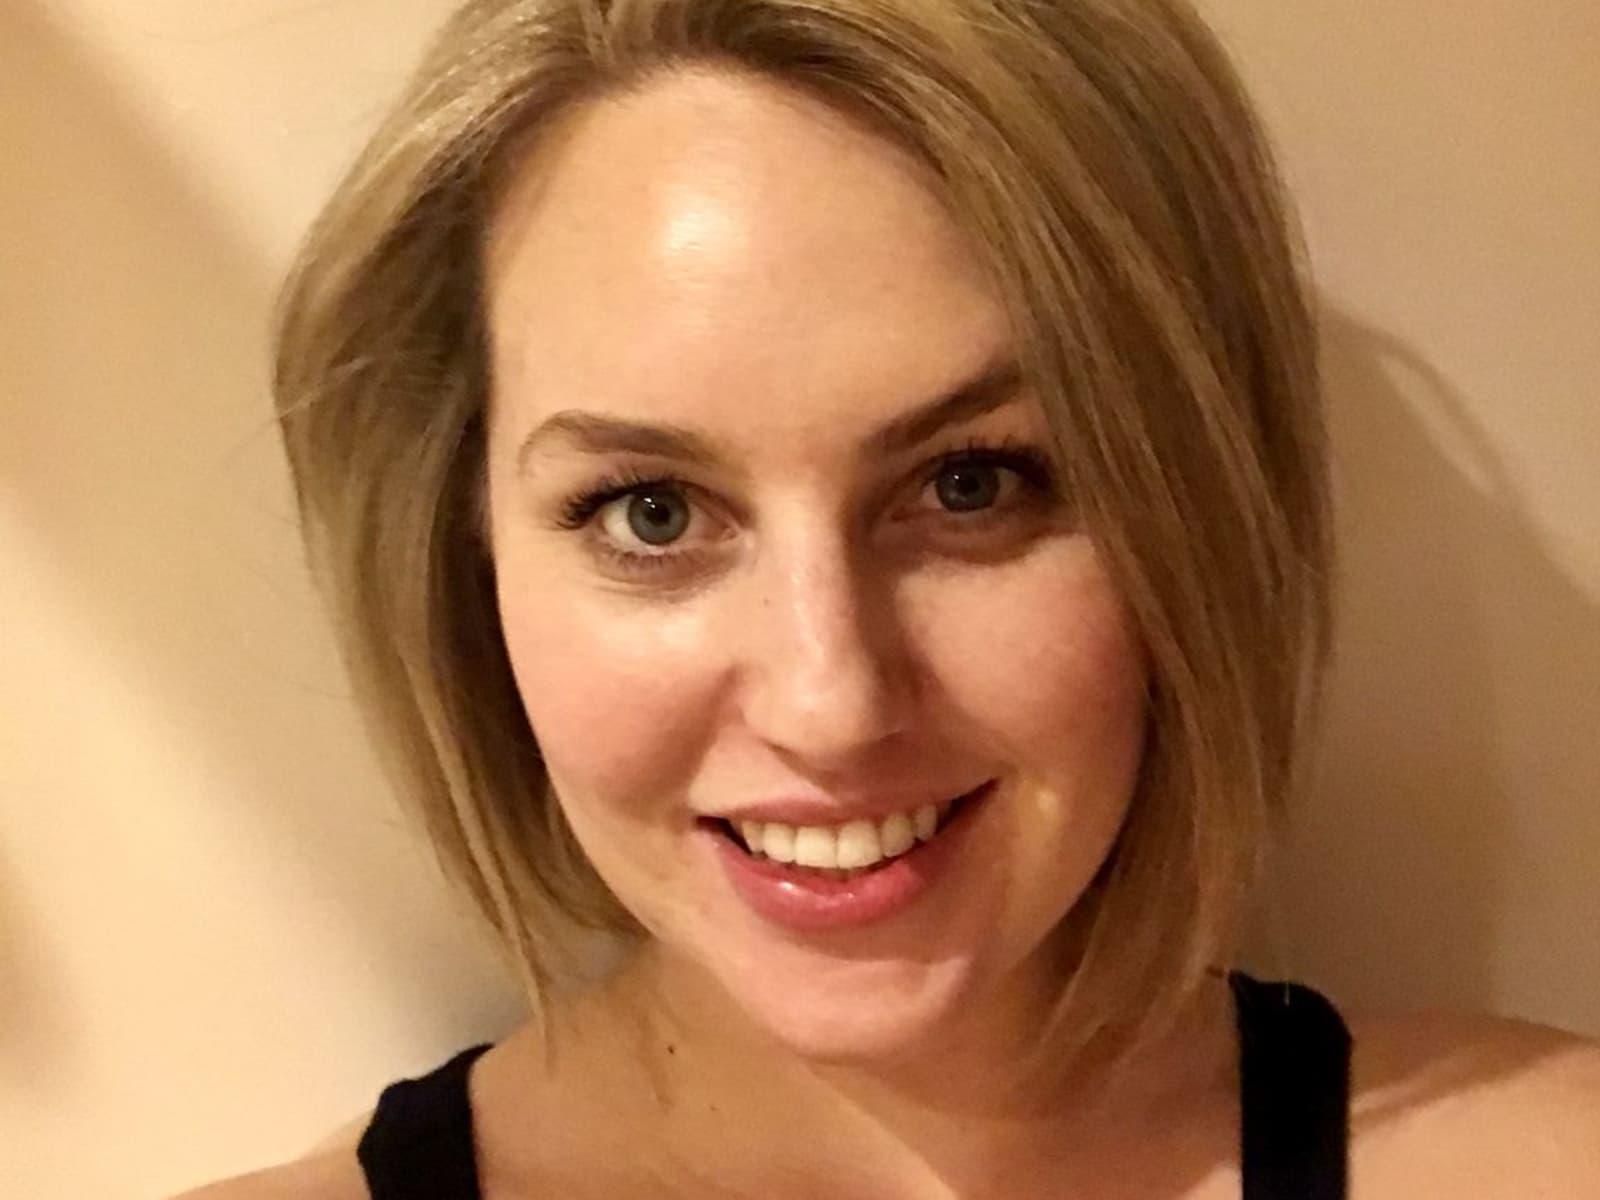 Kirsten from Melbourne, Victoria, Australia